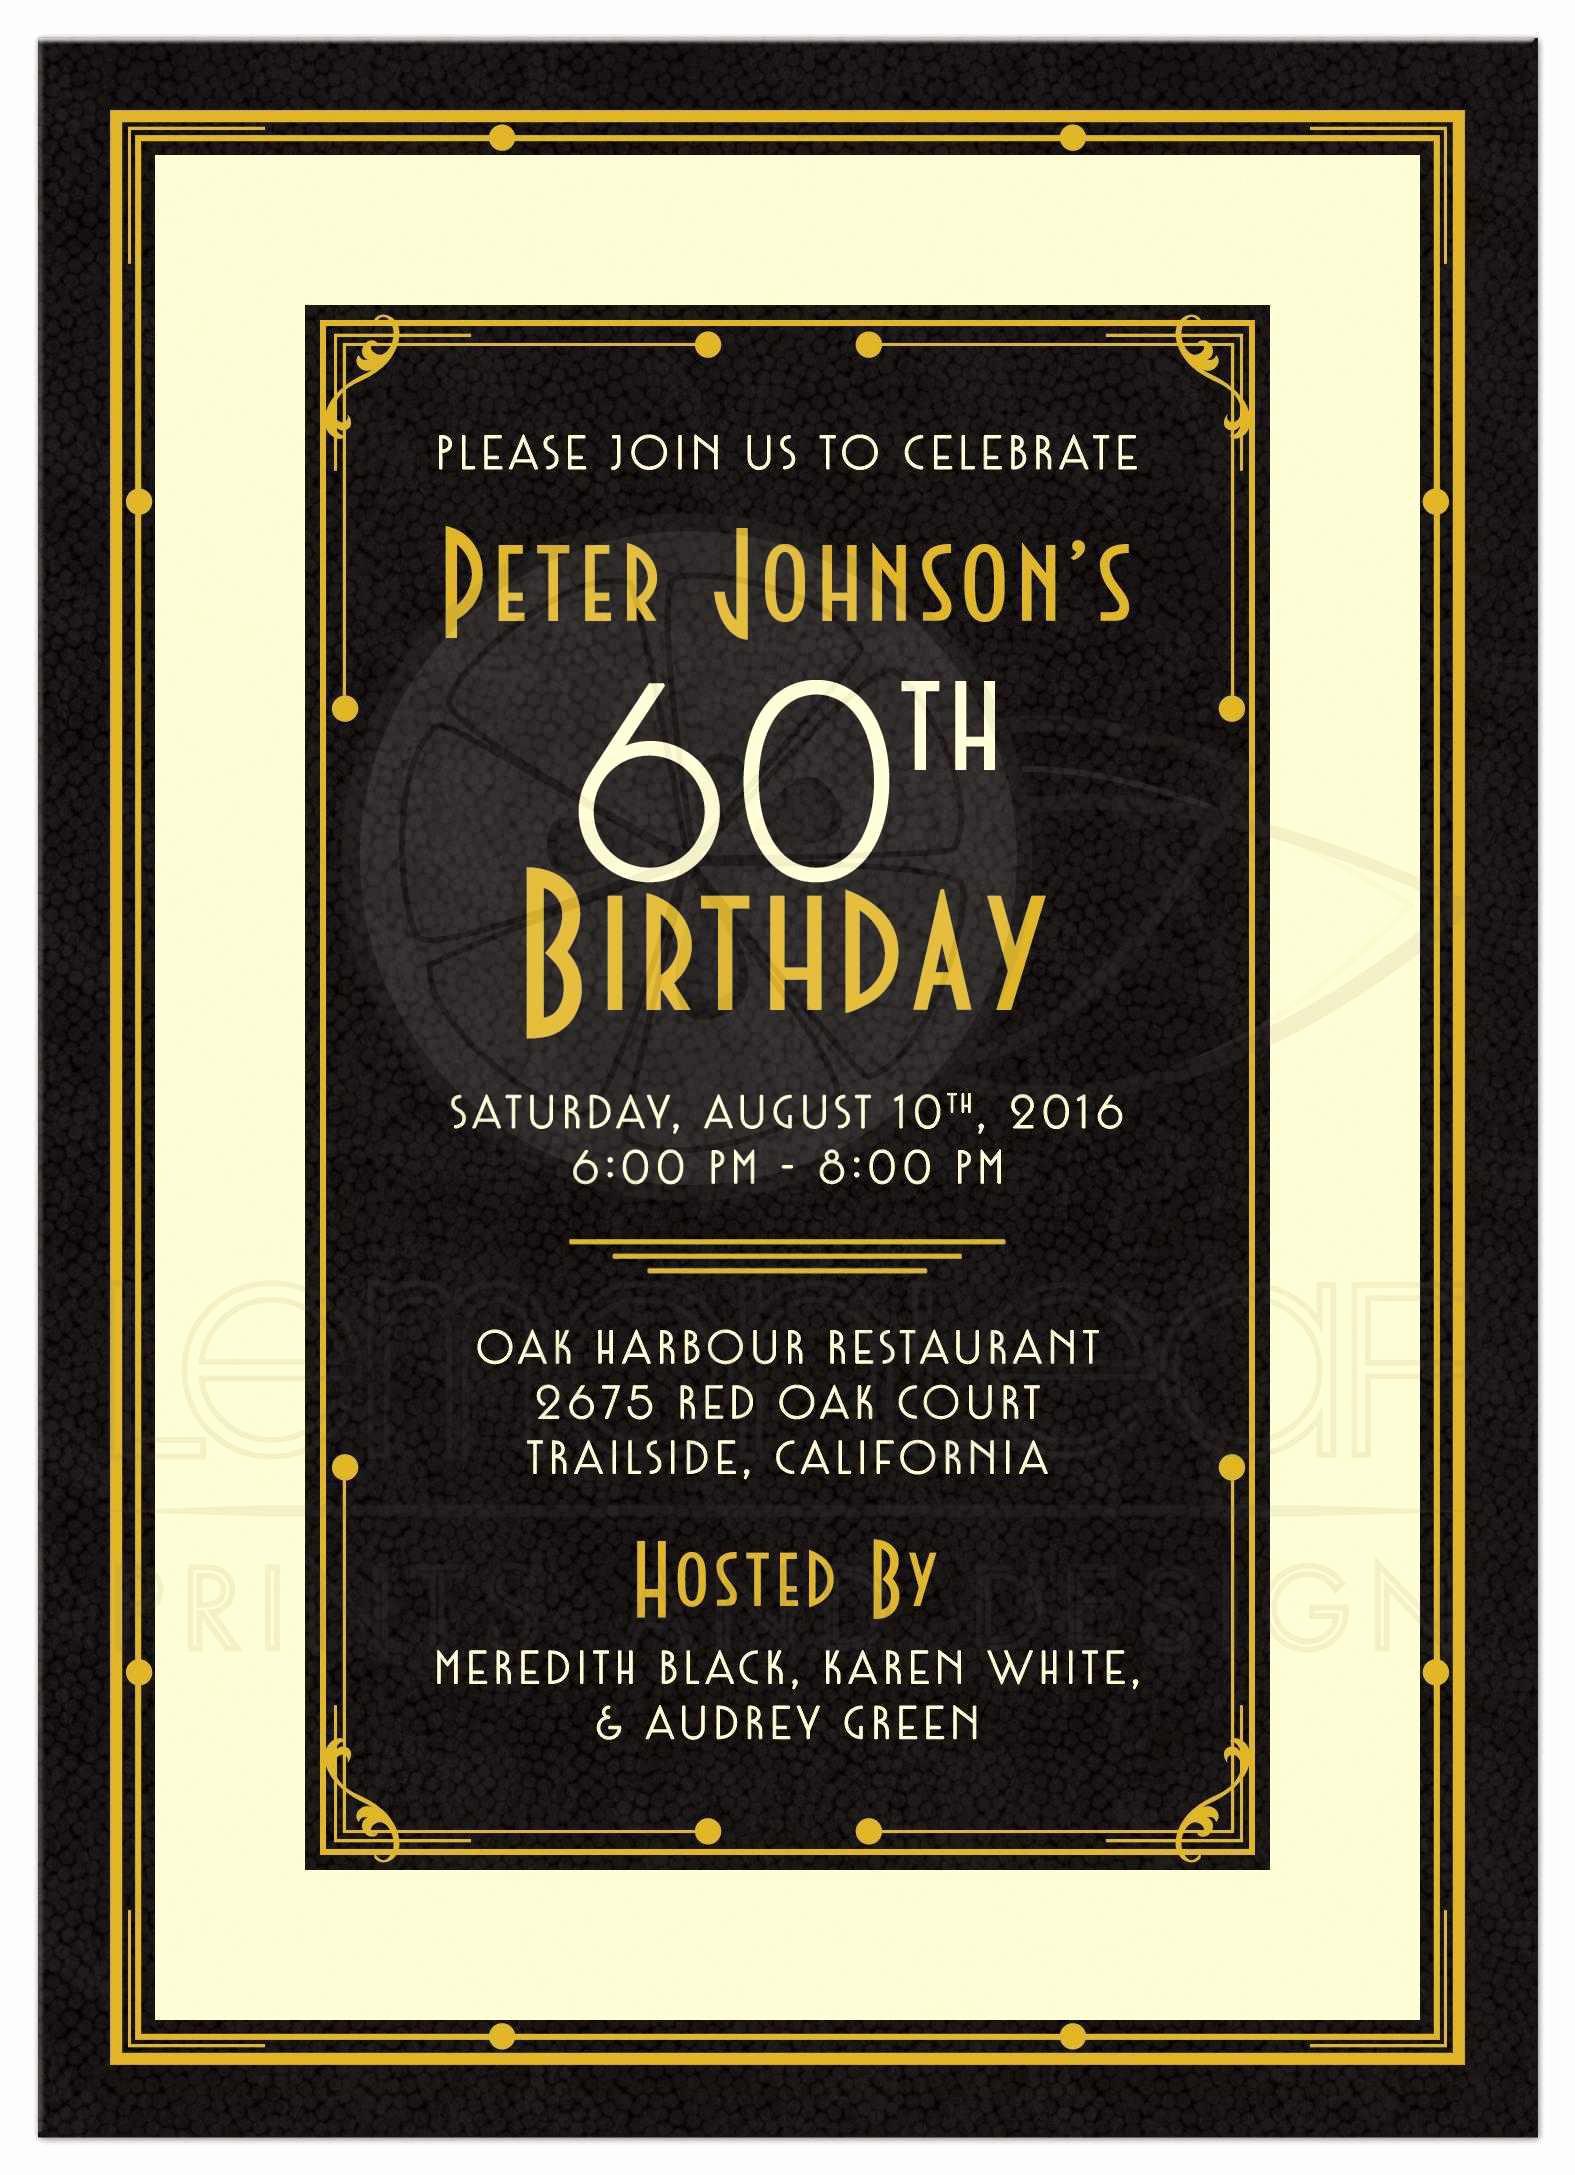 60th Birthday Invitations Template Inspirational 60th Birthday Party Invitations